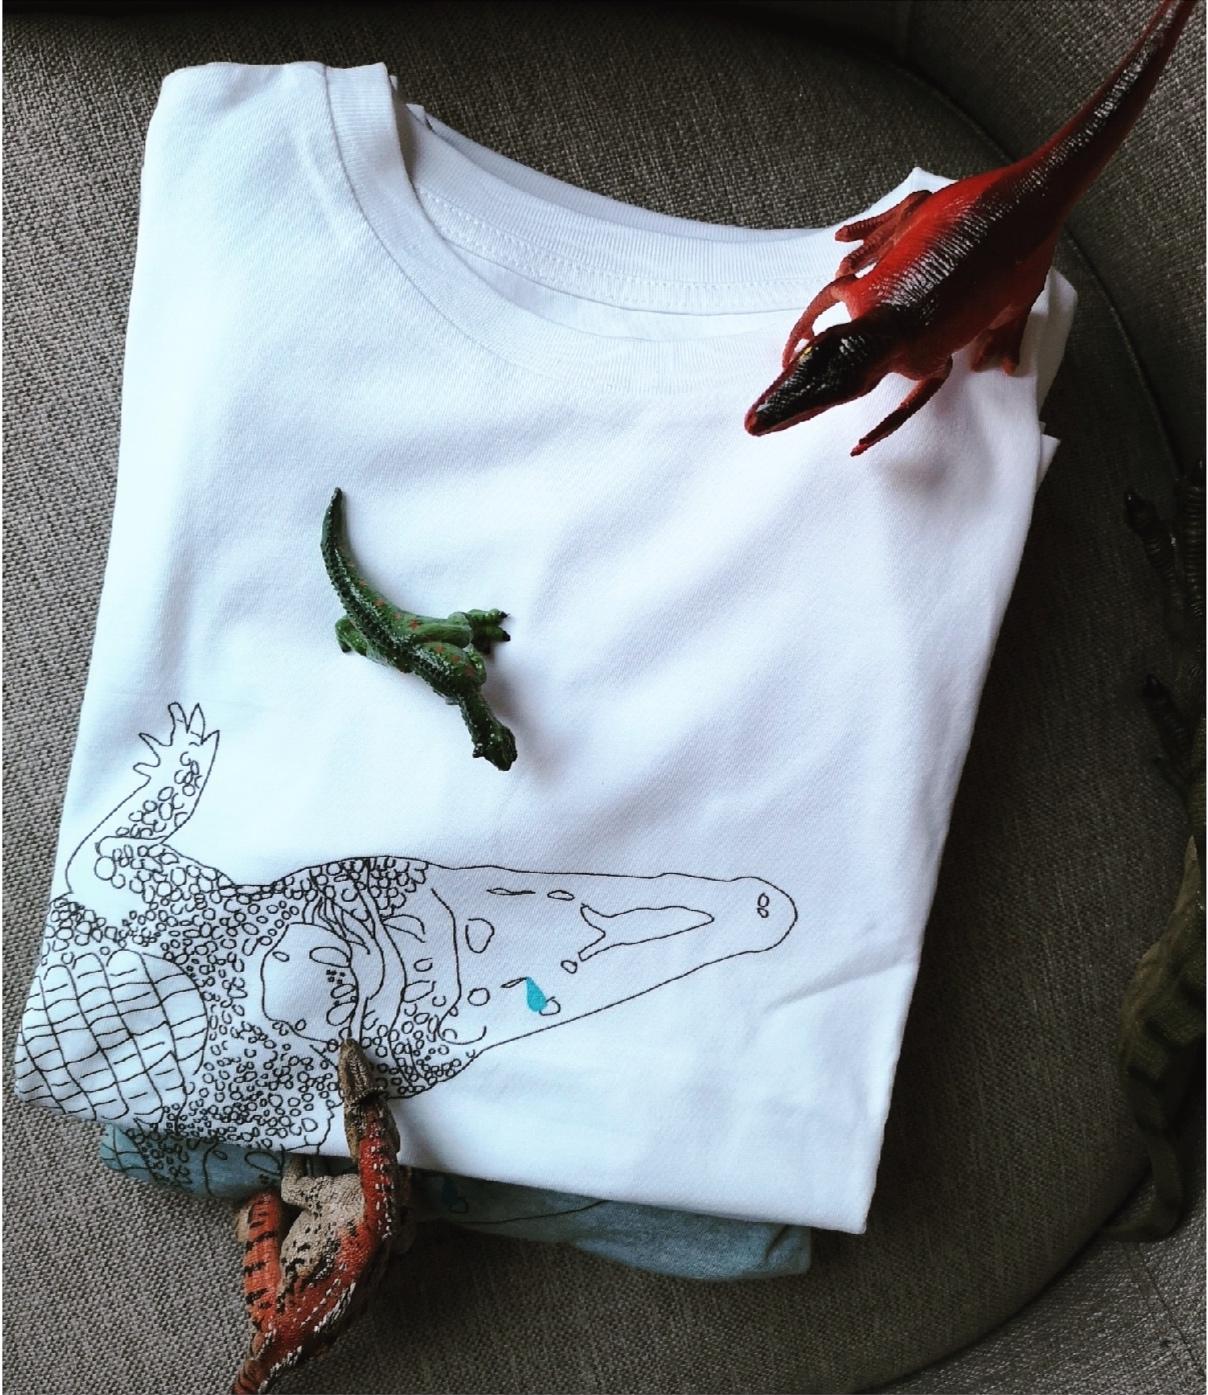 Crocodile tshirt - 30 €